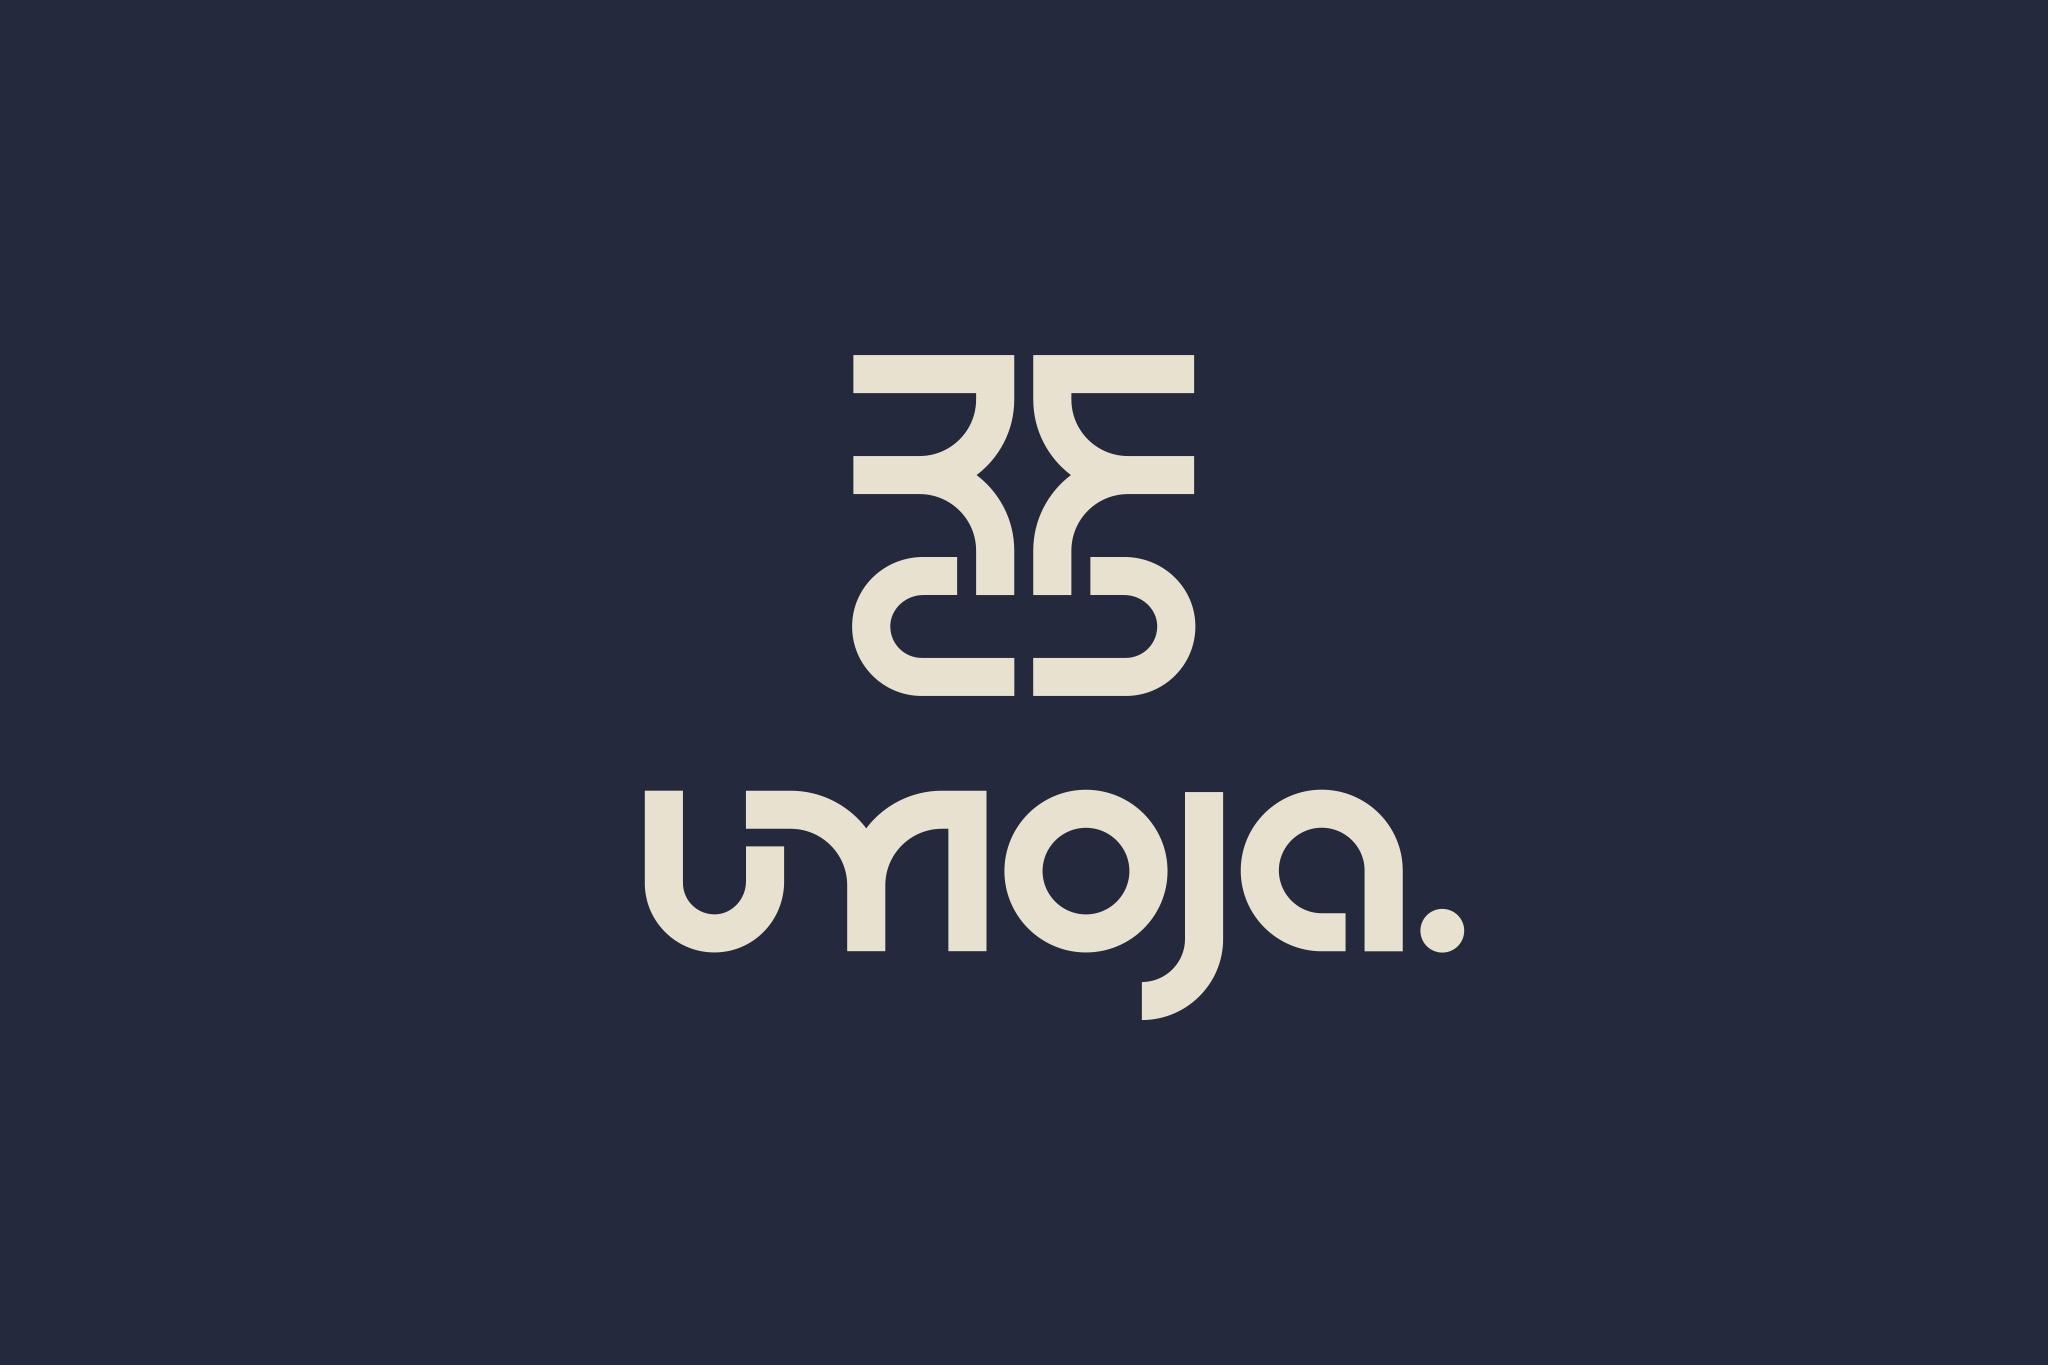 Thumbnail for umoja - Ethical Leisure Brand